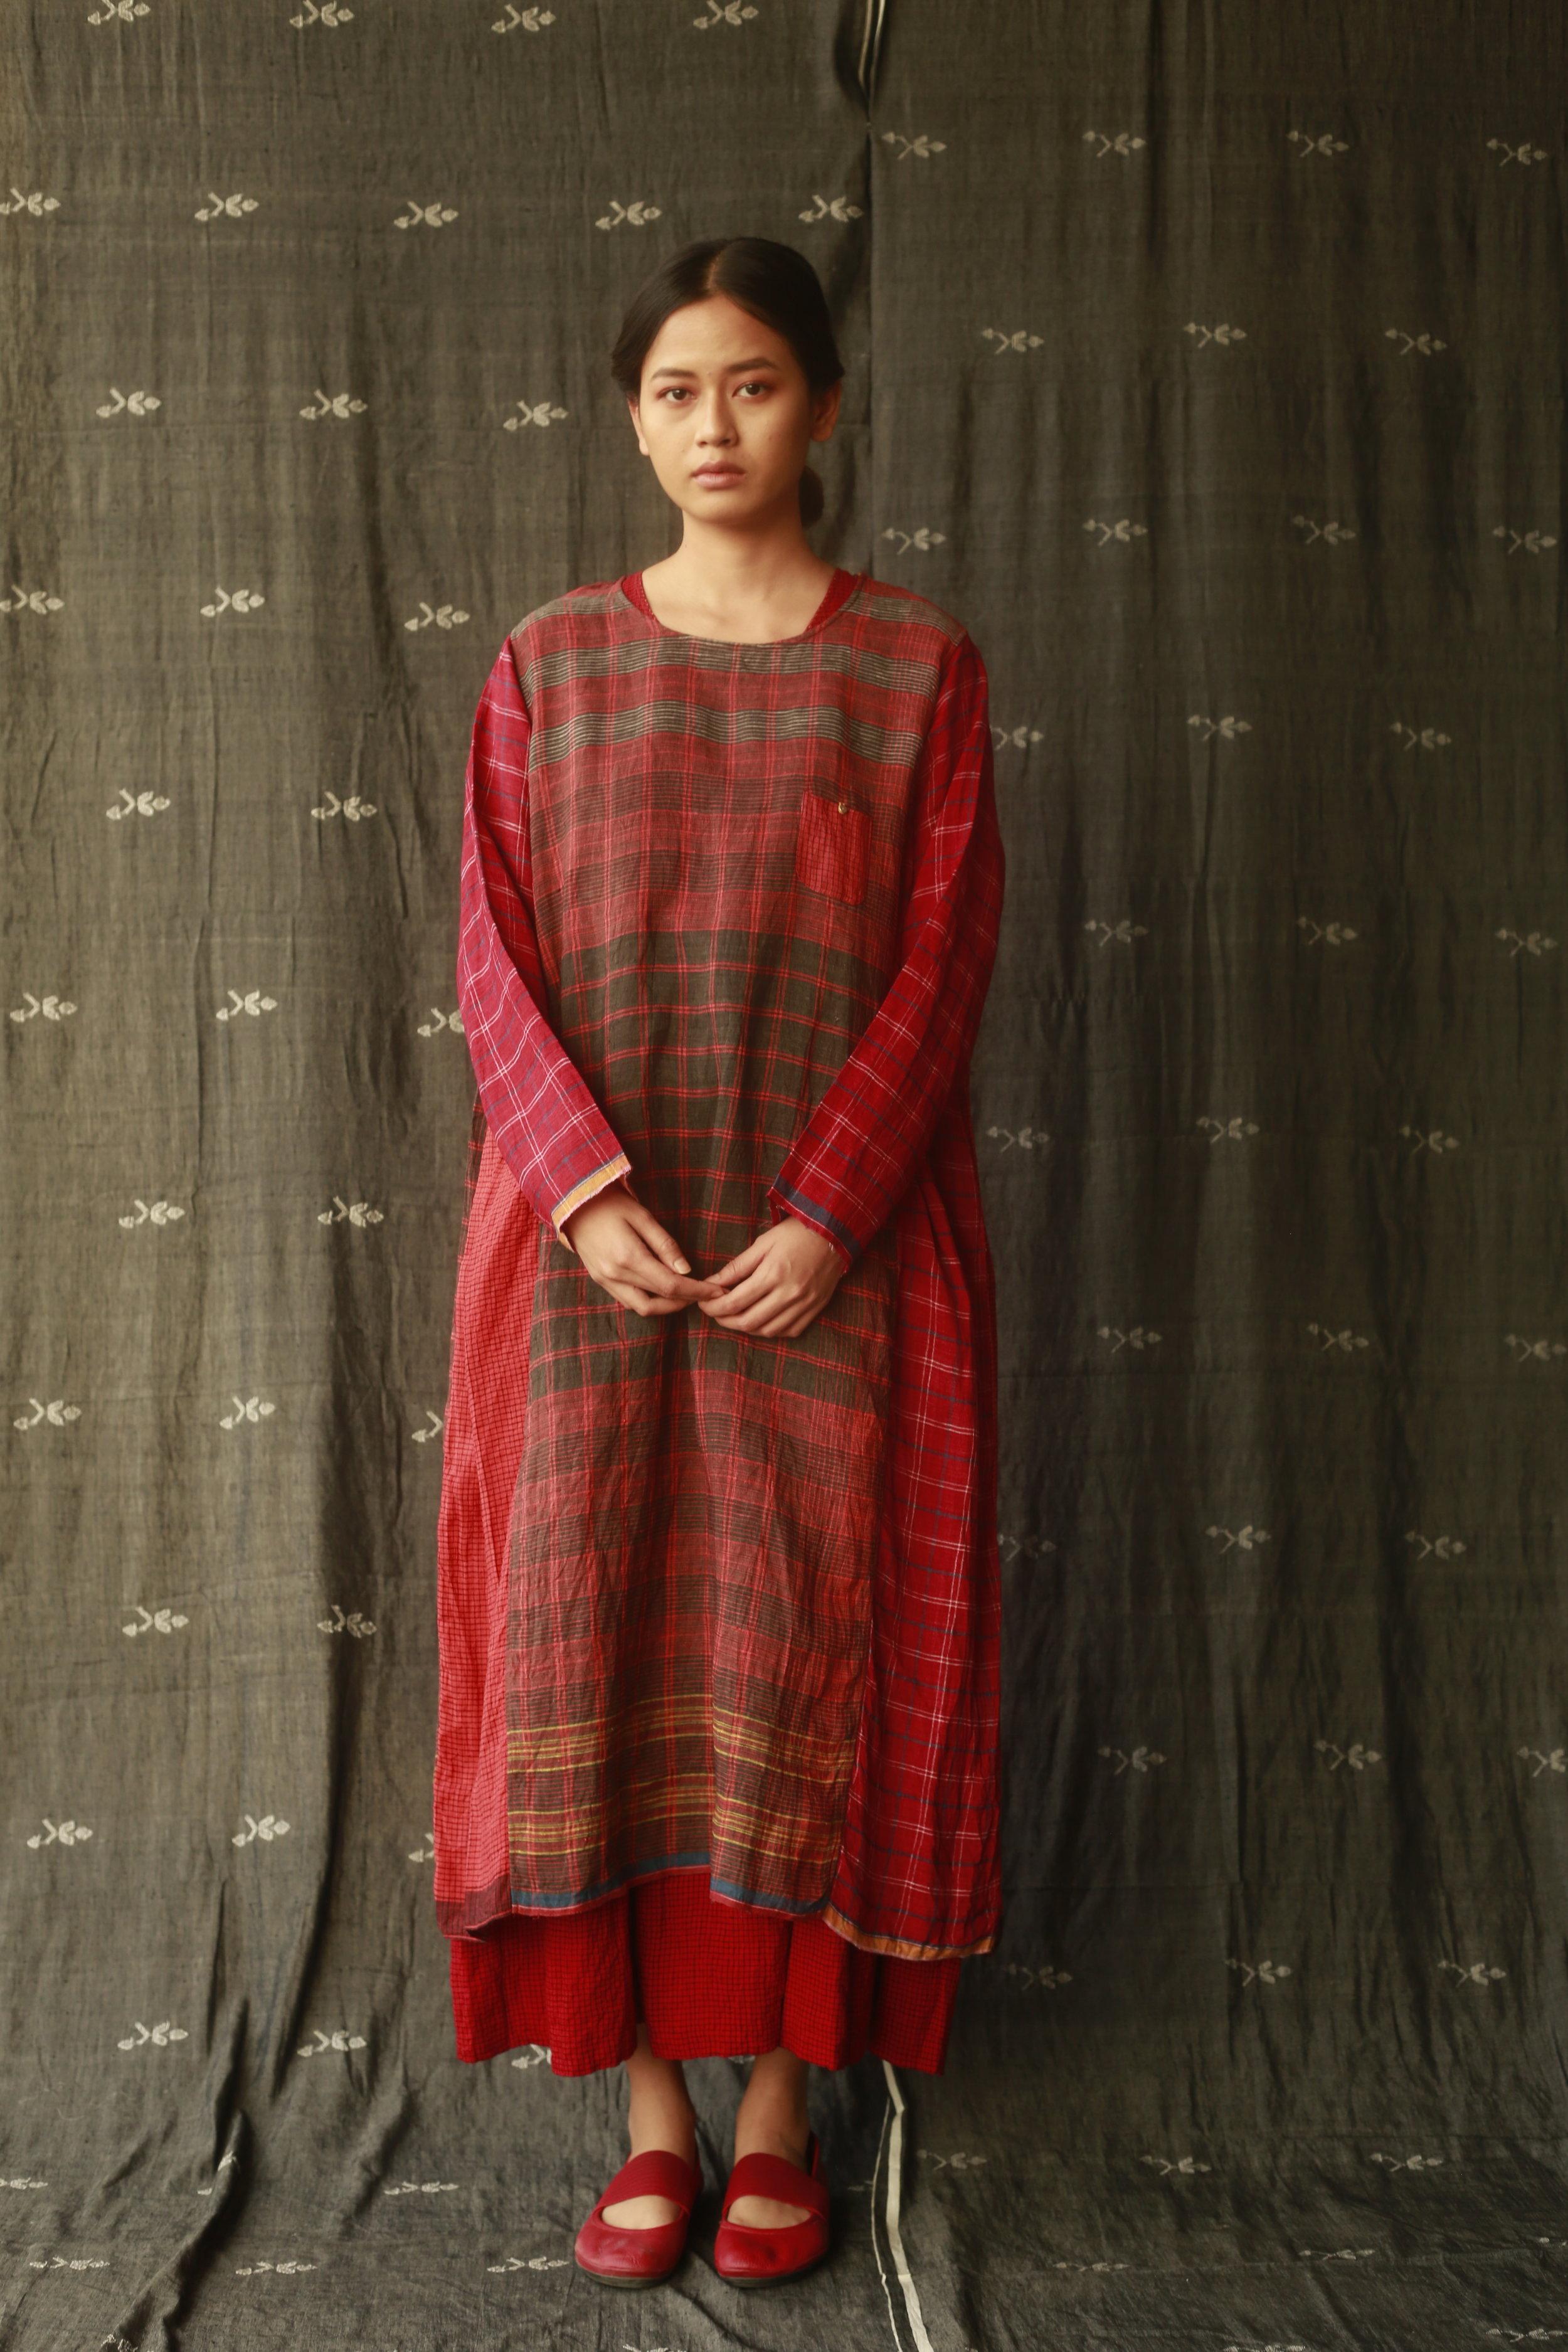 Chapel Collection  - Injiri, Eka dresses, tunics, jackets, scarves